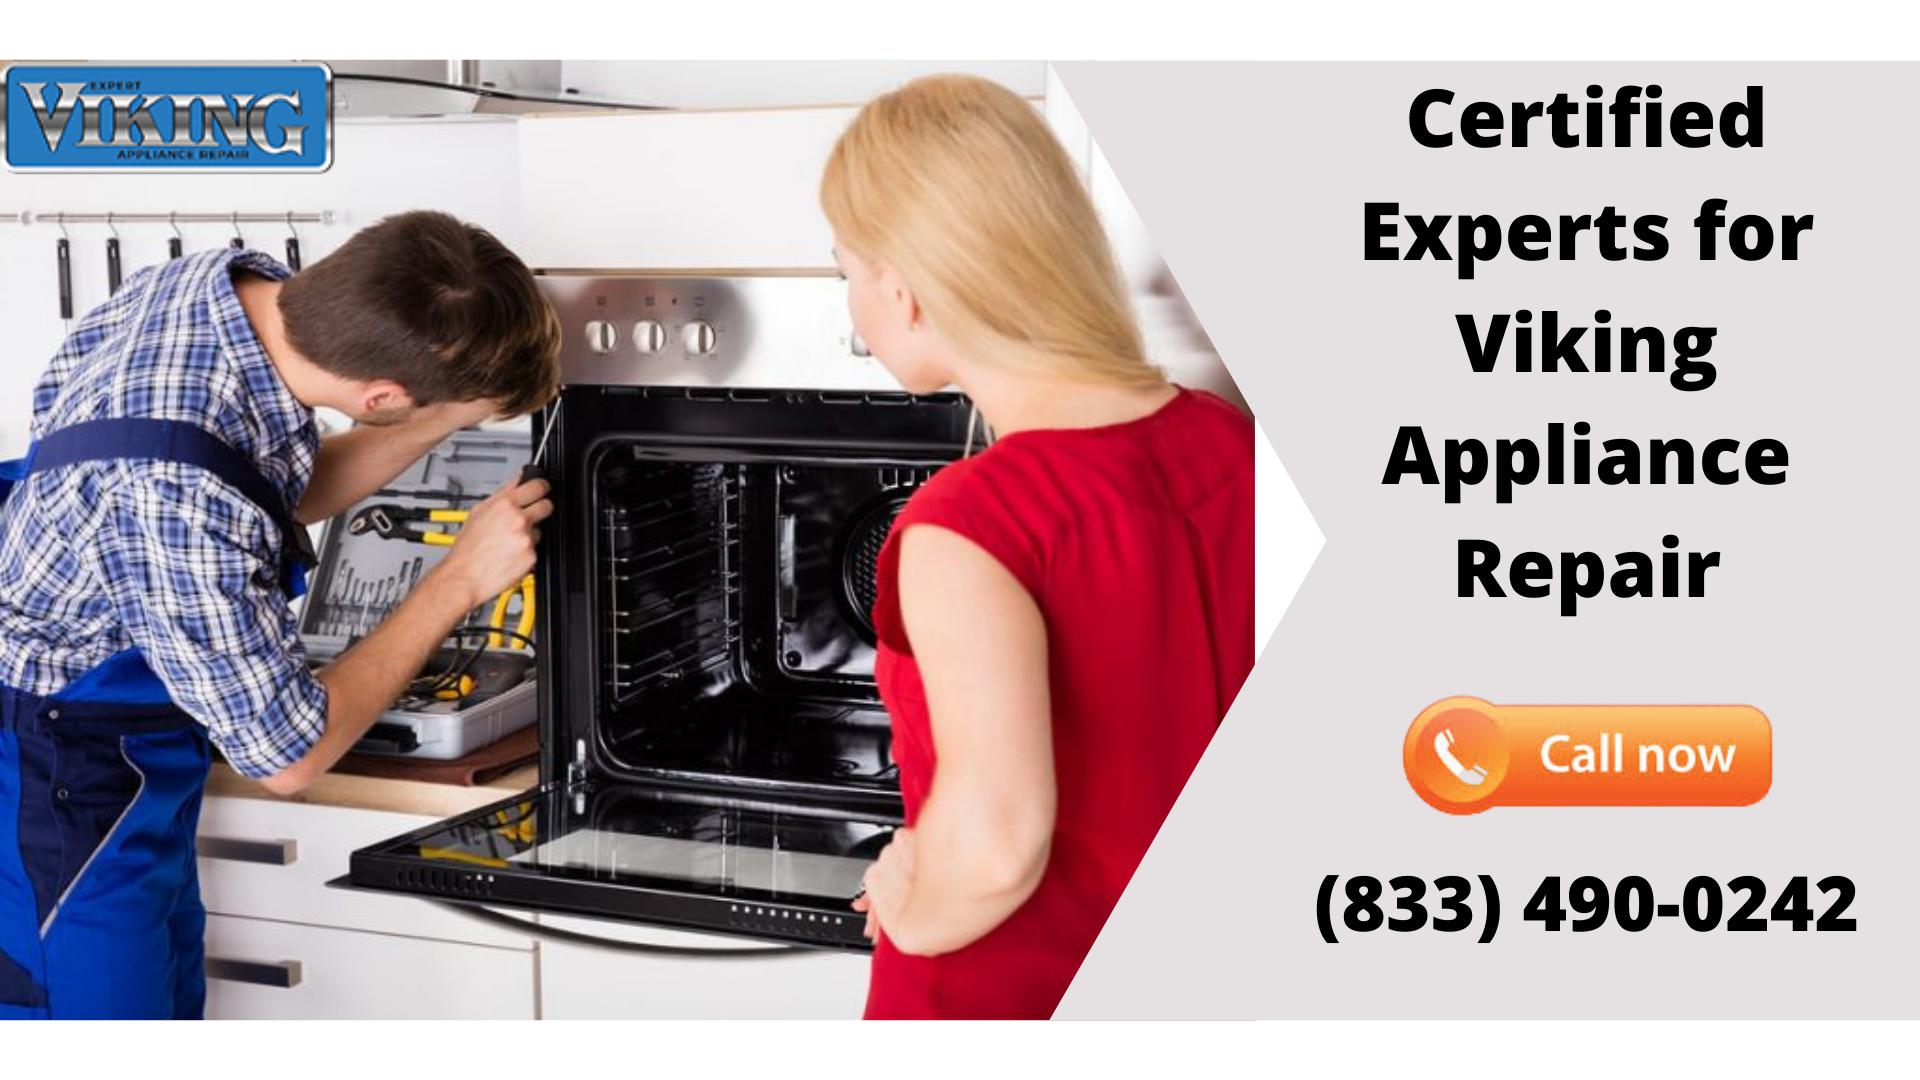 Top-Notch Viking Appliance Repair Service